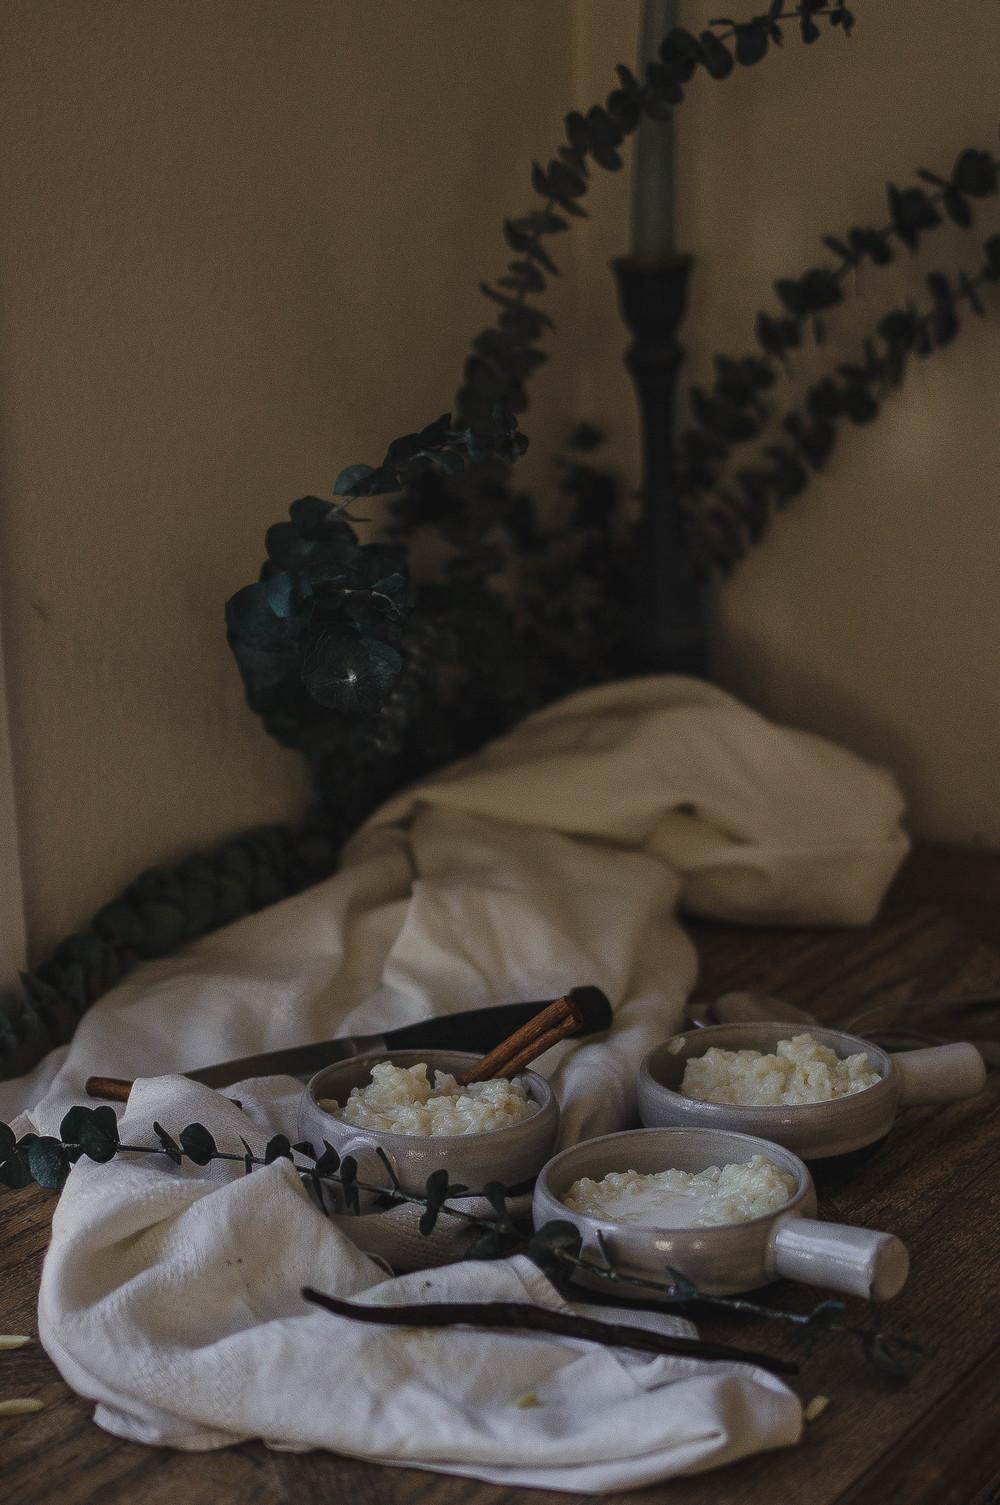 Como hacer el mejor arroz con leche estilo argentino | by fit for the soul